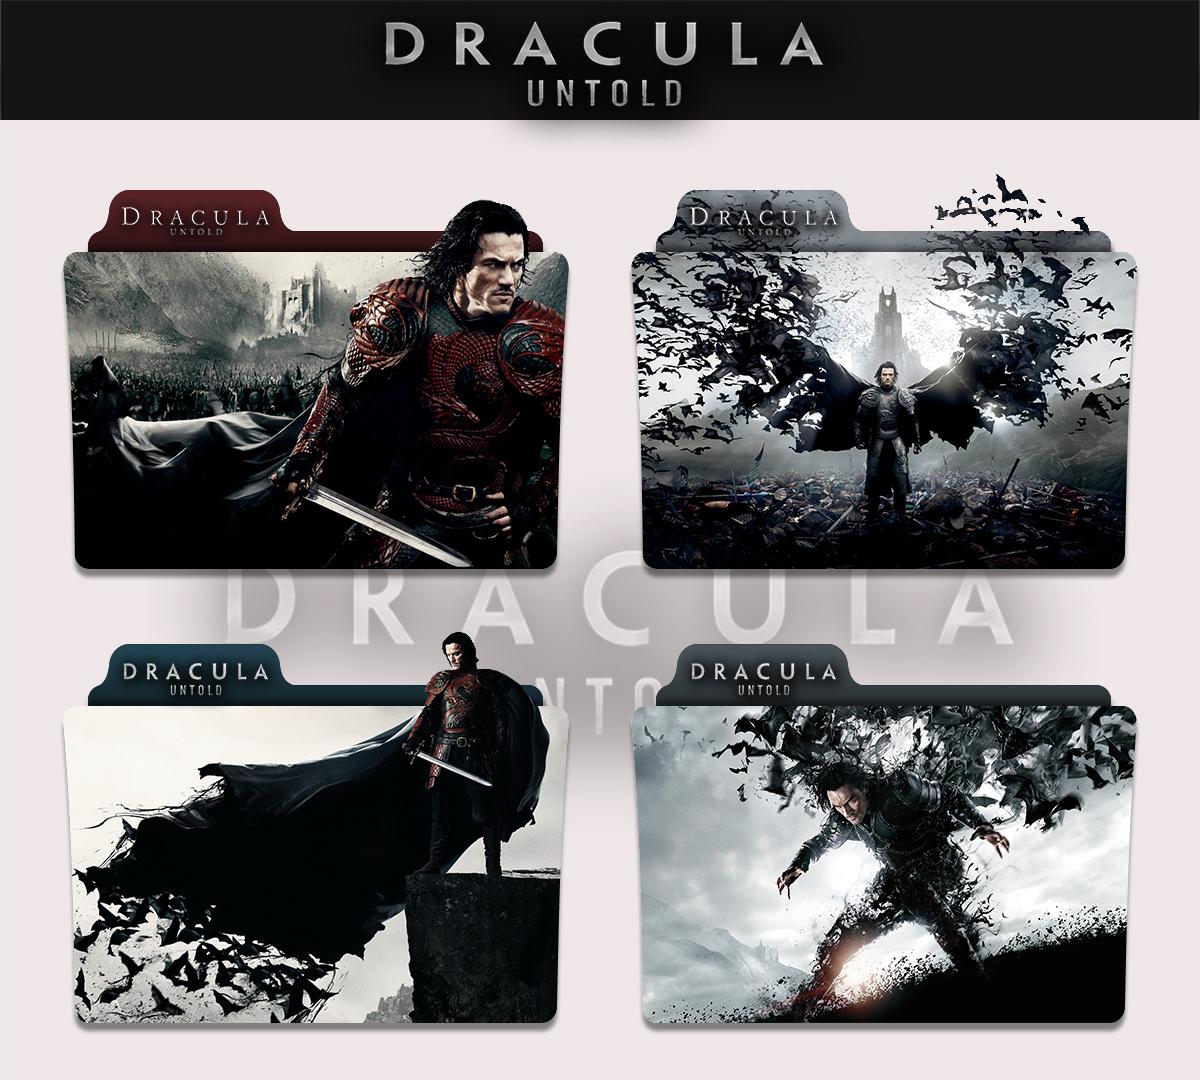 Dracula Untold 2014 Folder Icon By Sonerbyzt On Deviantart